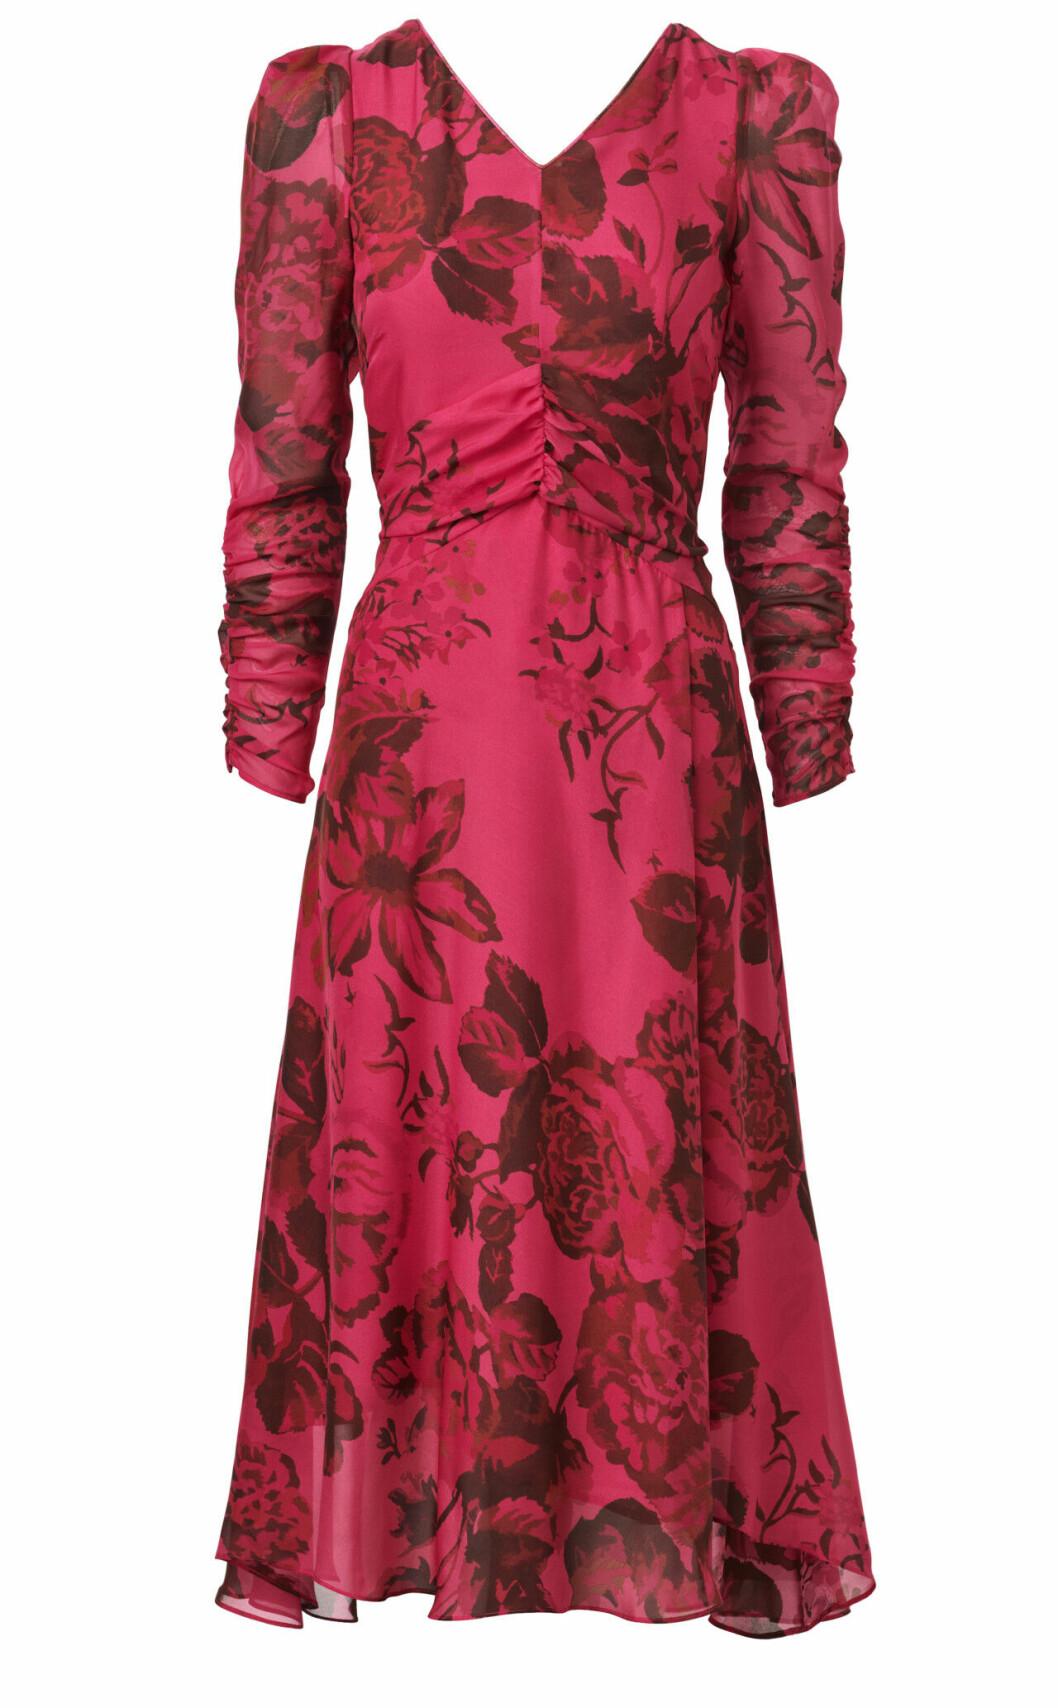 H&M Conscious Exclusive AW19 –klänning med puffärm